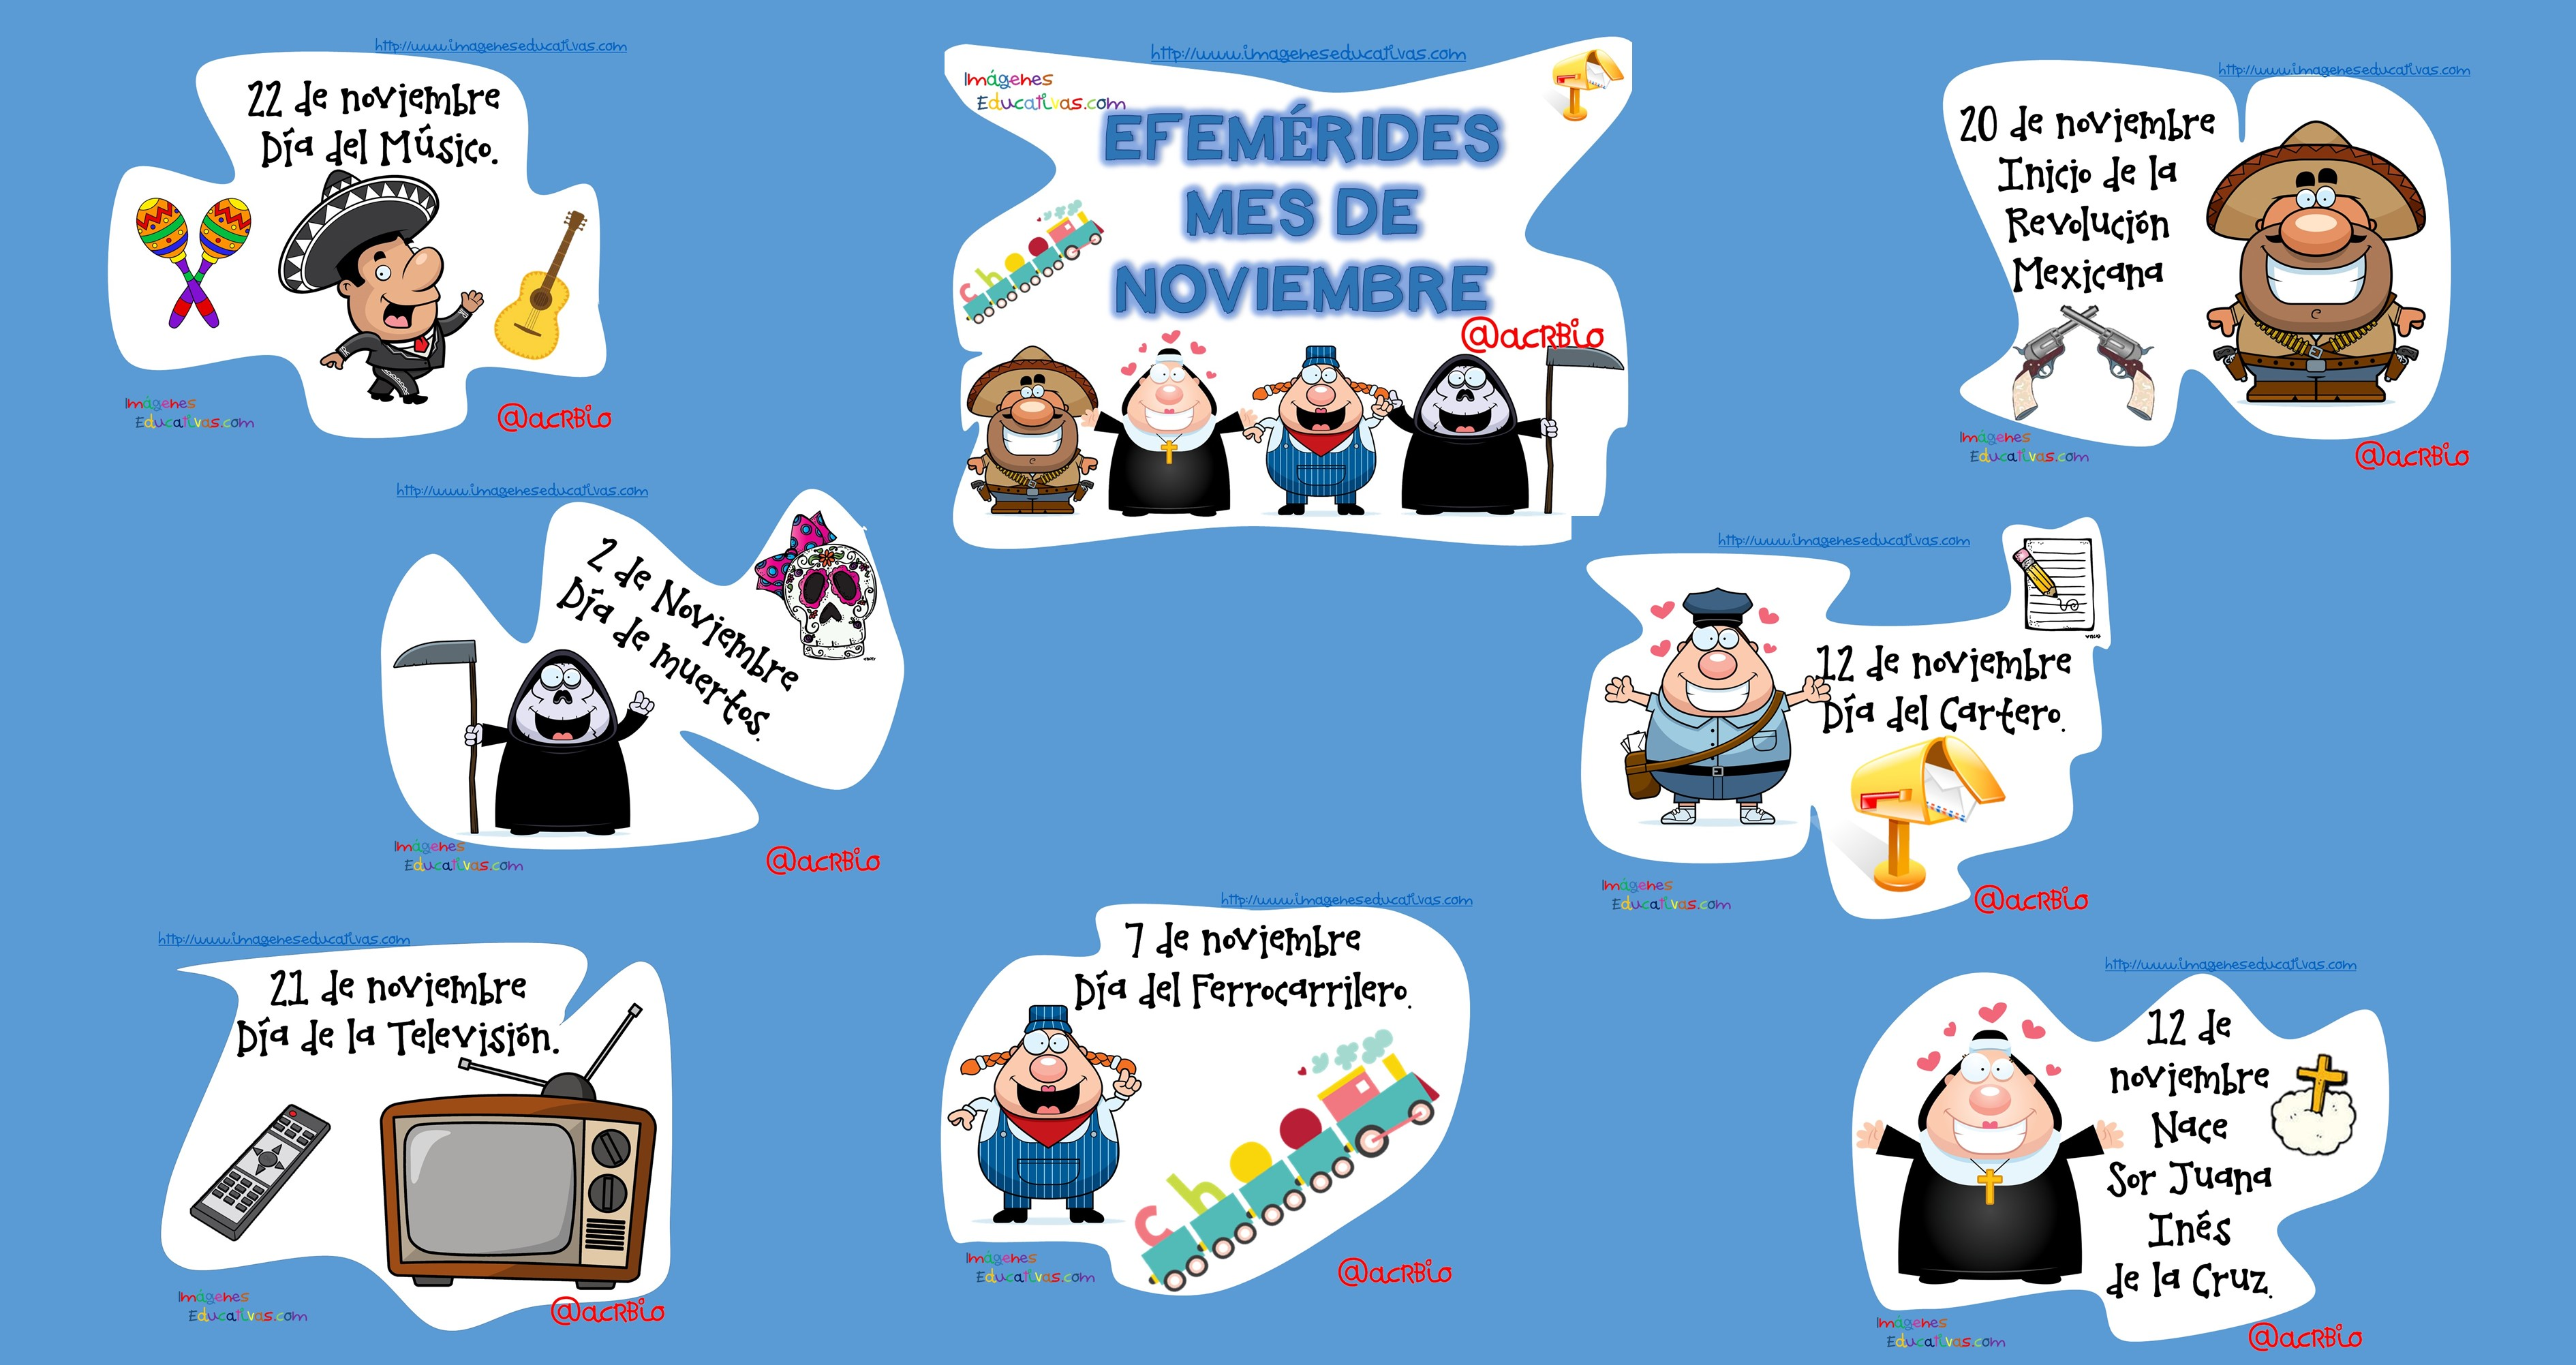 Periodico mural noviembre imagenes educativas for Concepto de periodico mural